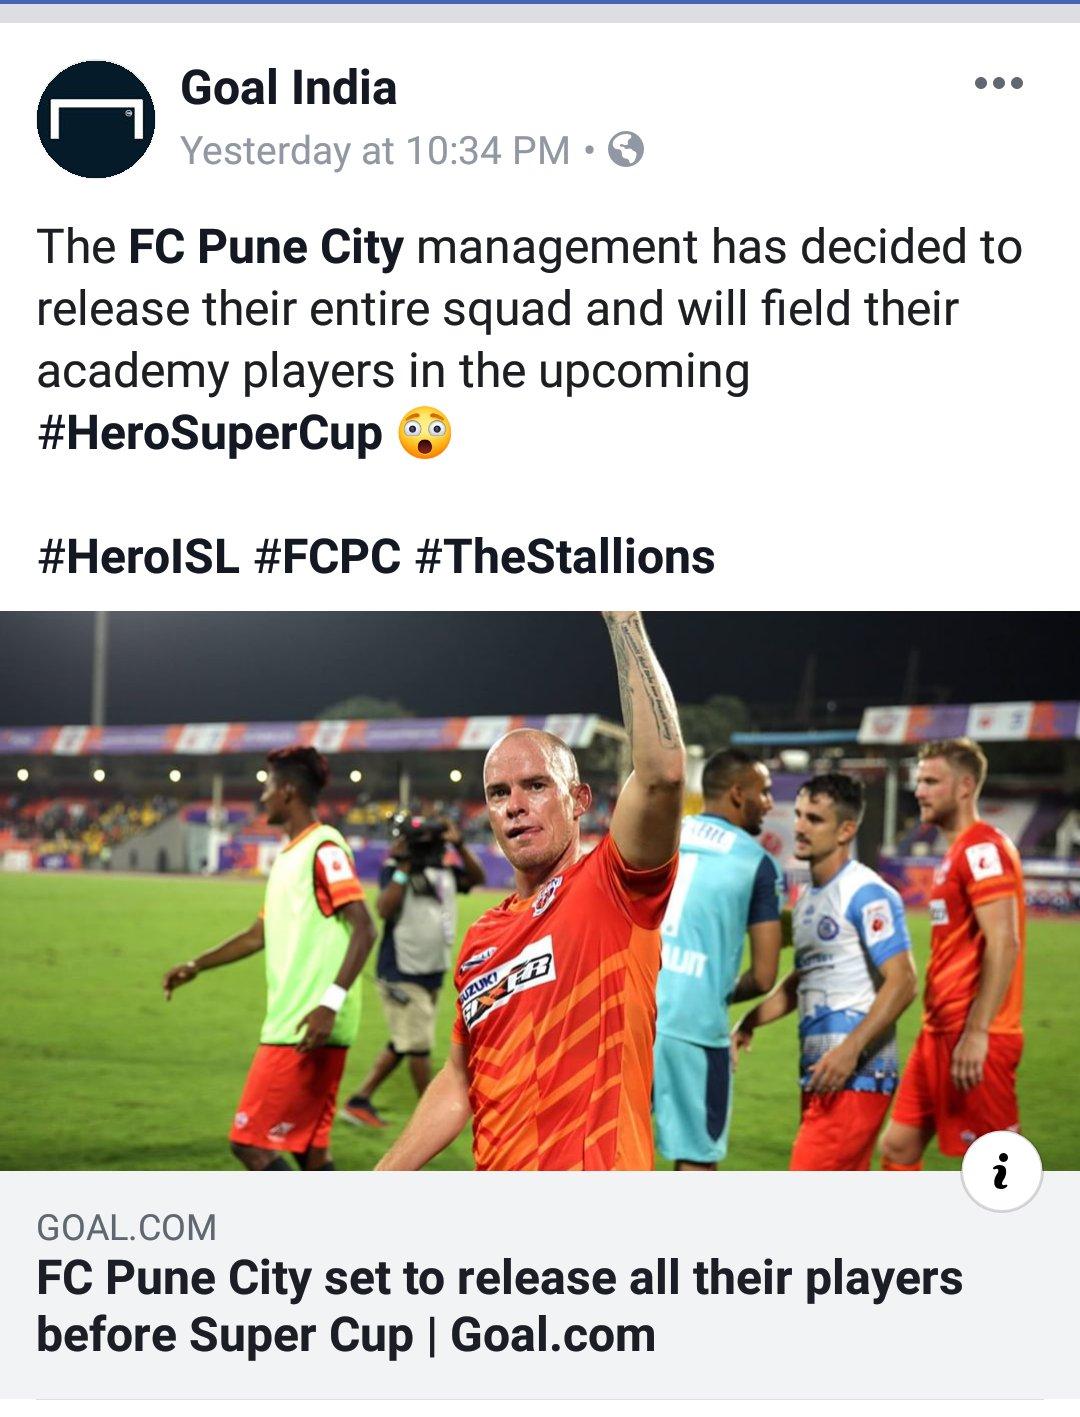 FC Pune City makes a Big Statement about the club's immediate future screenshot 20190304 09170128345880835273866440.